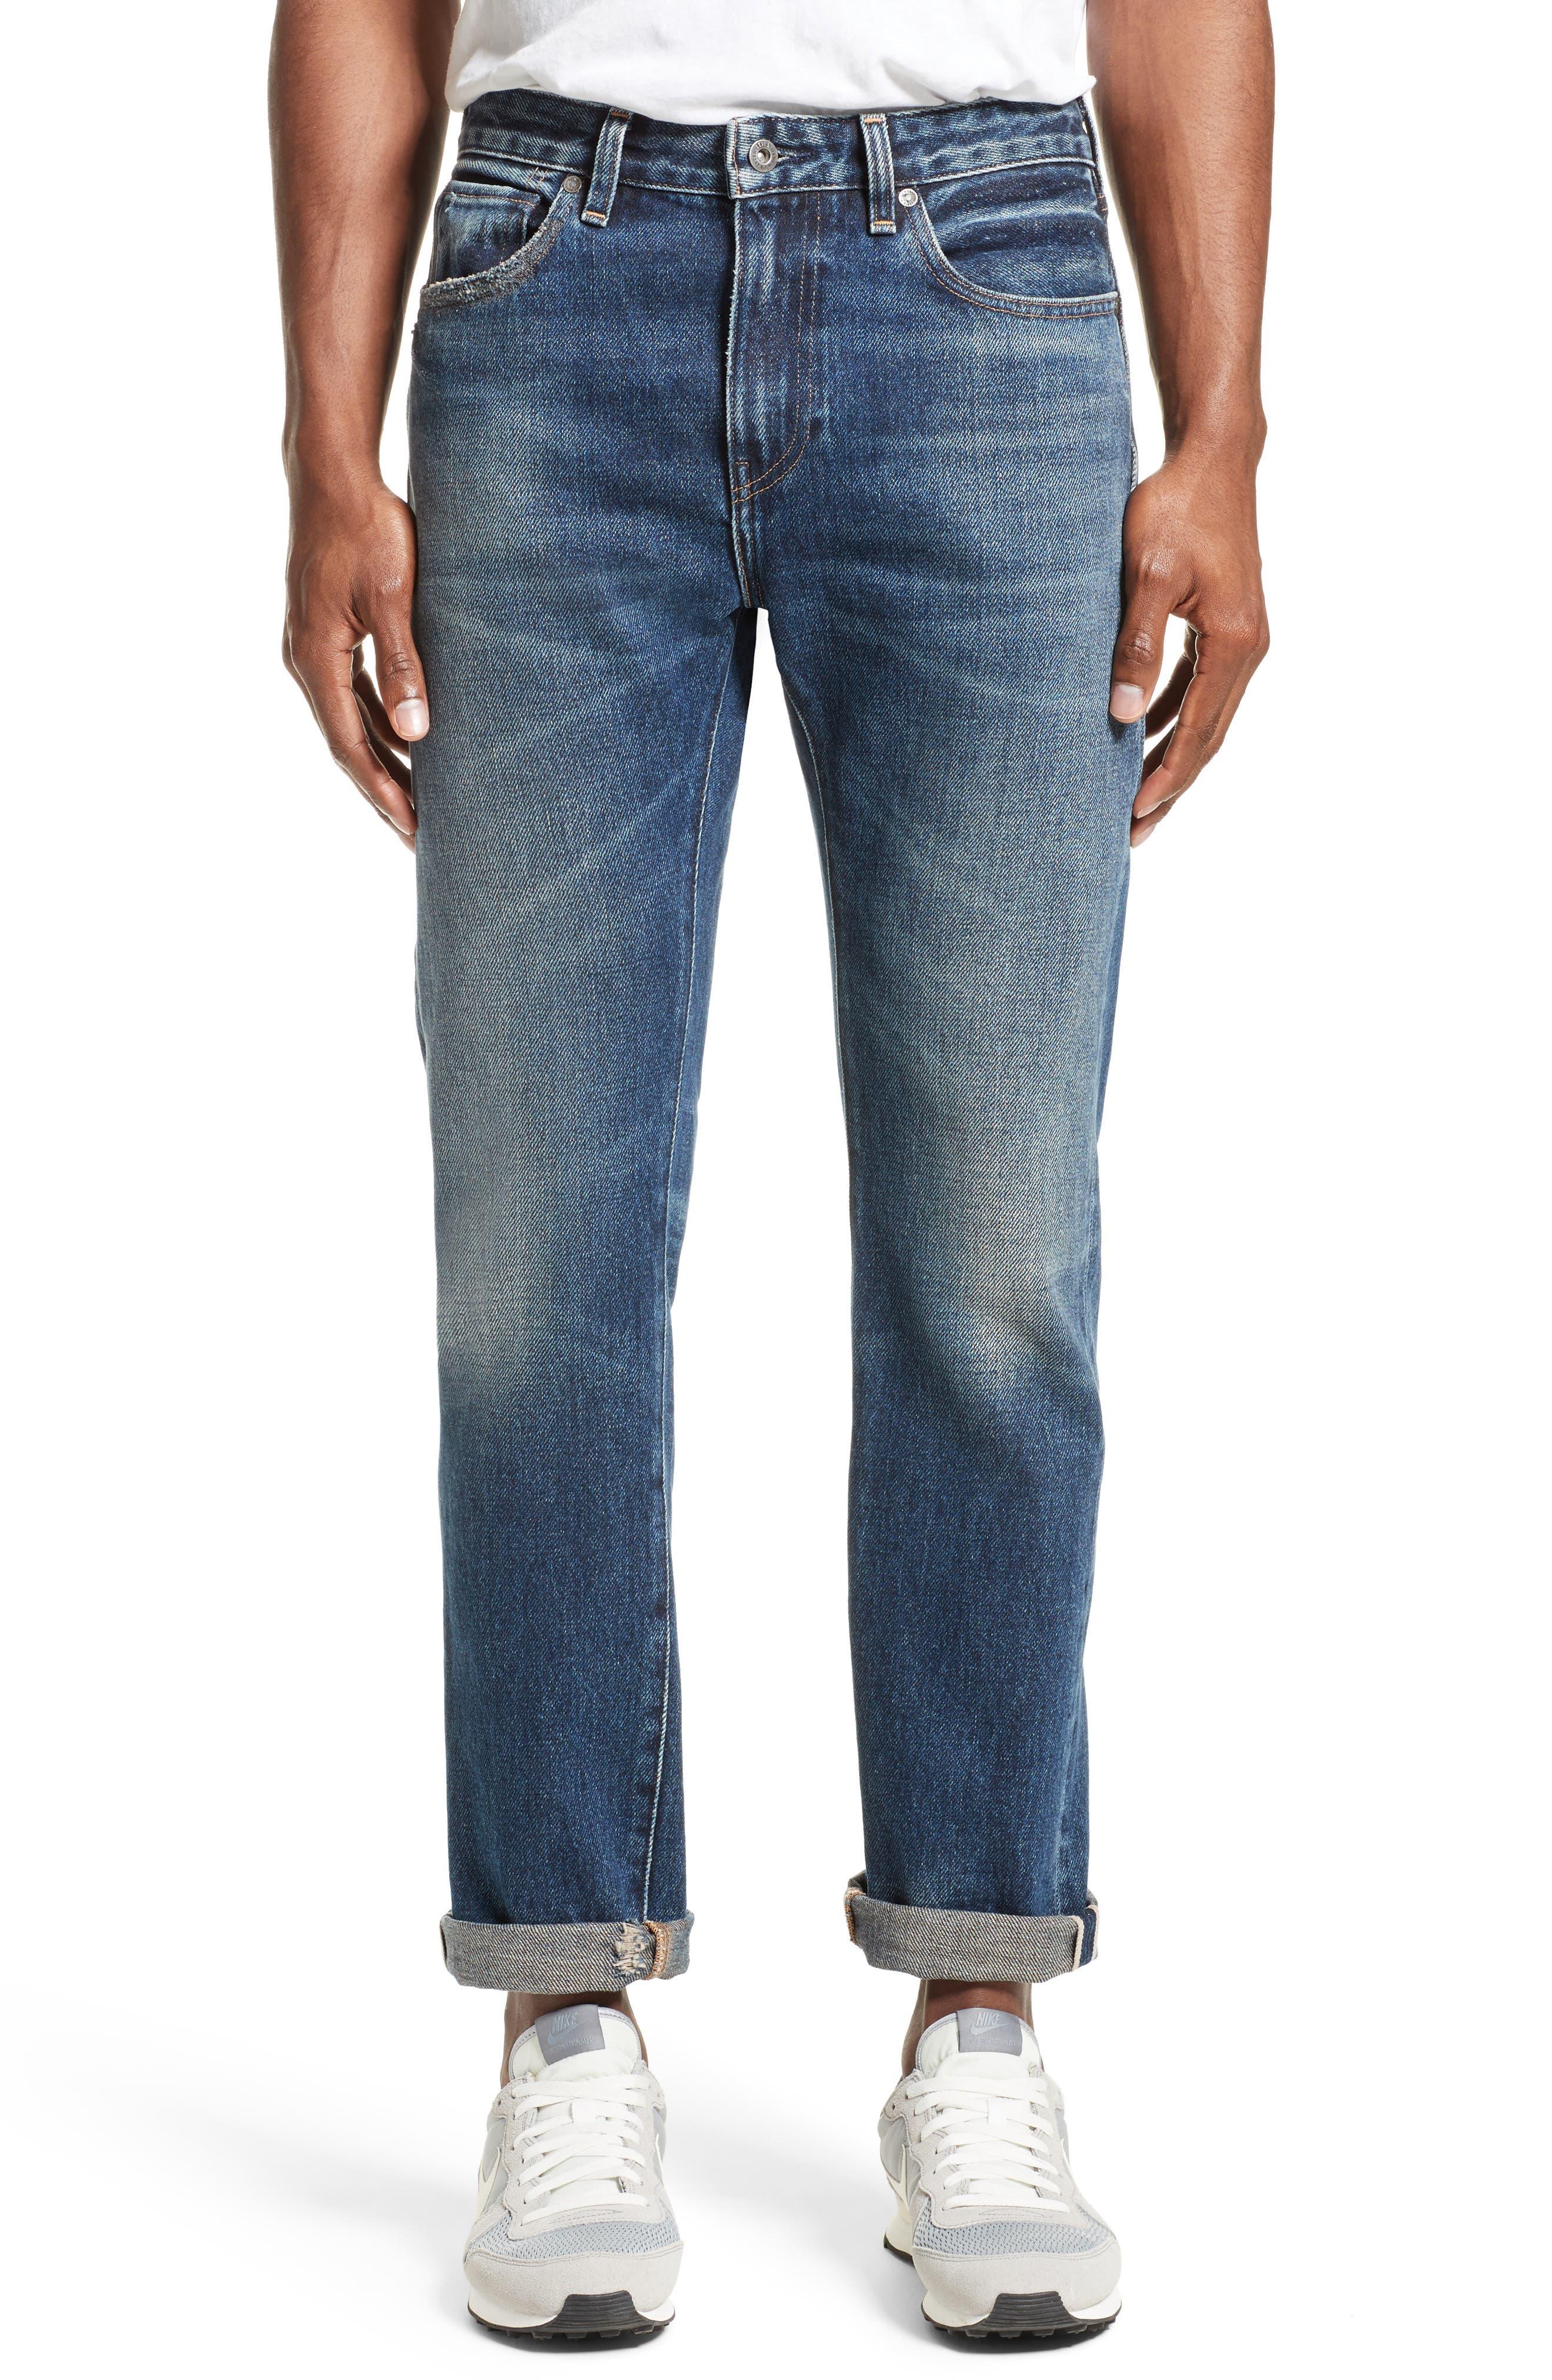 Tack Slim Fit Jeans,                             Main thumbnail 1, color,                             420